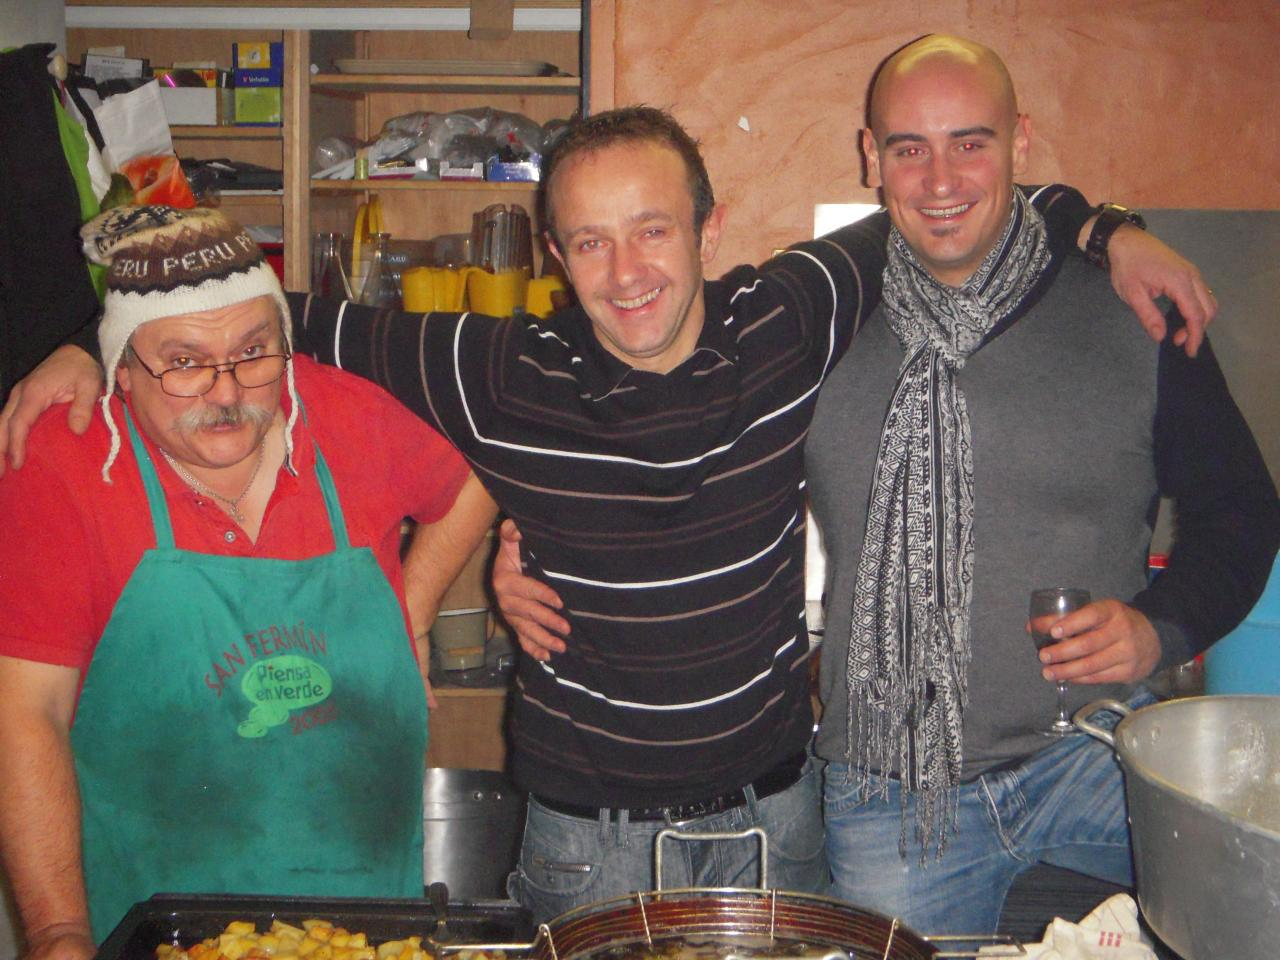 Basques avec l'ami Péruvien